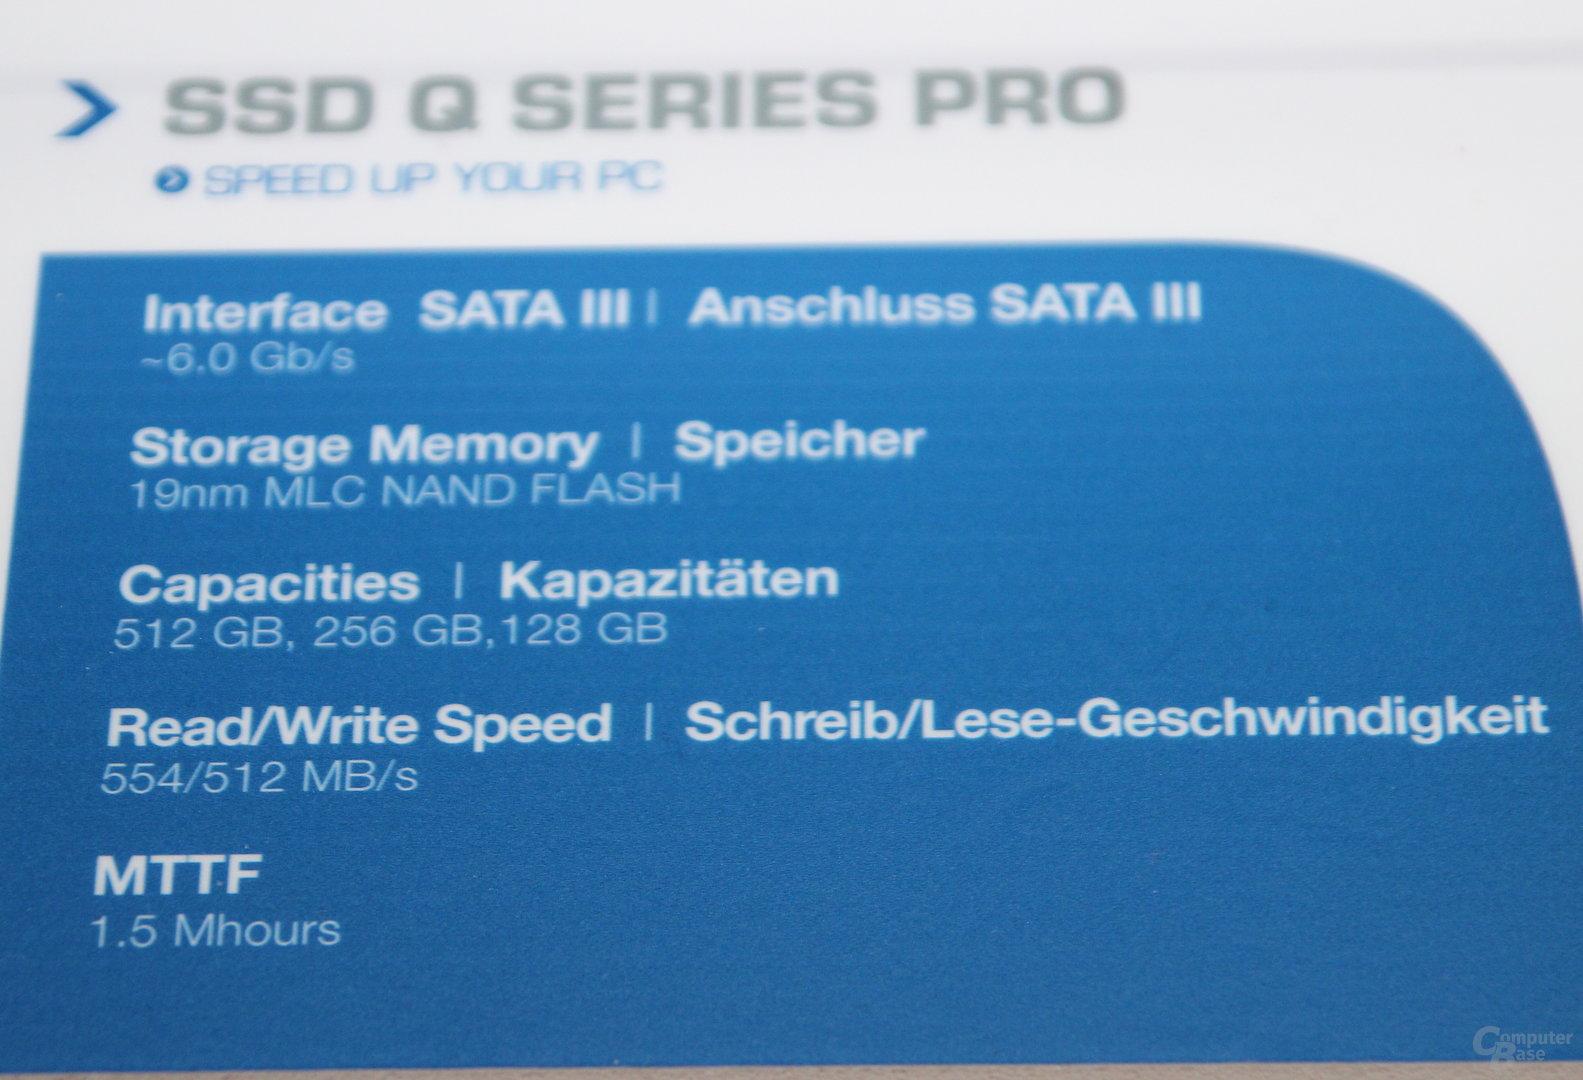 Toshiba SSD Q Pro Series